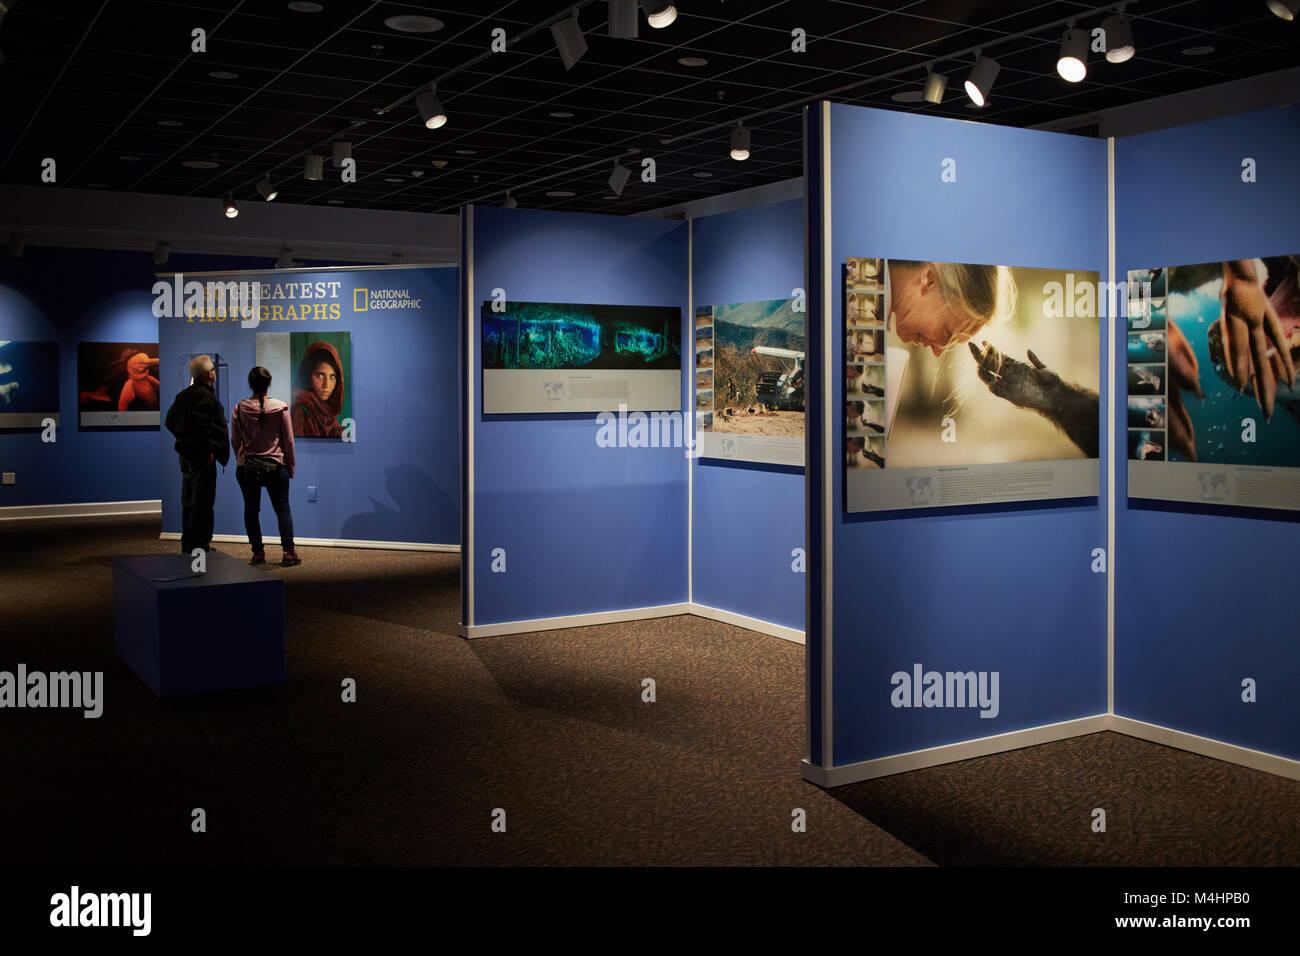 National Geographic 50 Greatest Photographs exhibit at the South Florida Museum, Bradenton, Florida - Stock Image